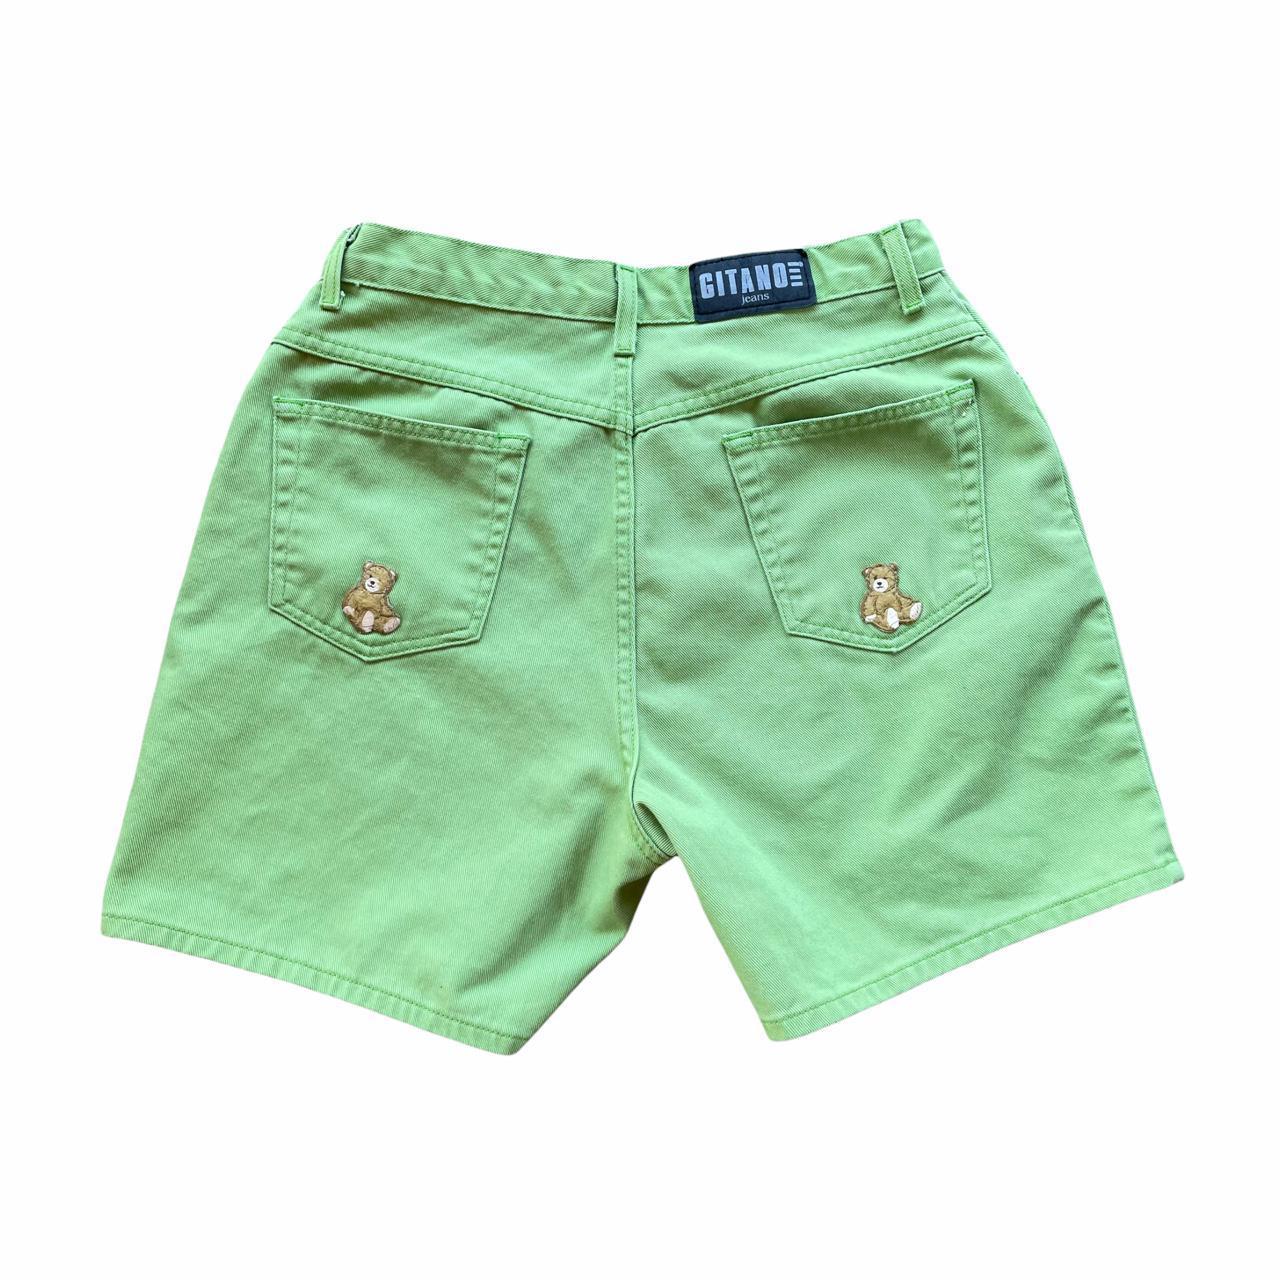 Product Image 1 - Vintage 90s green Gitano high